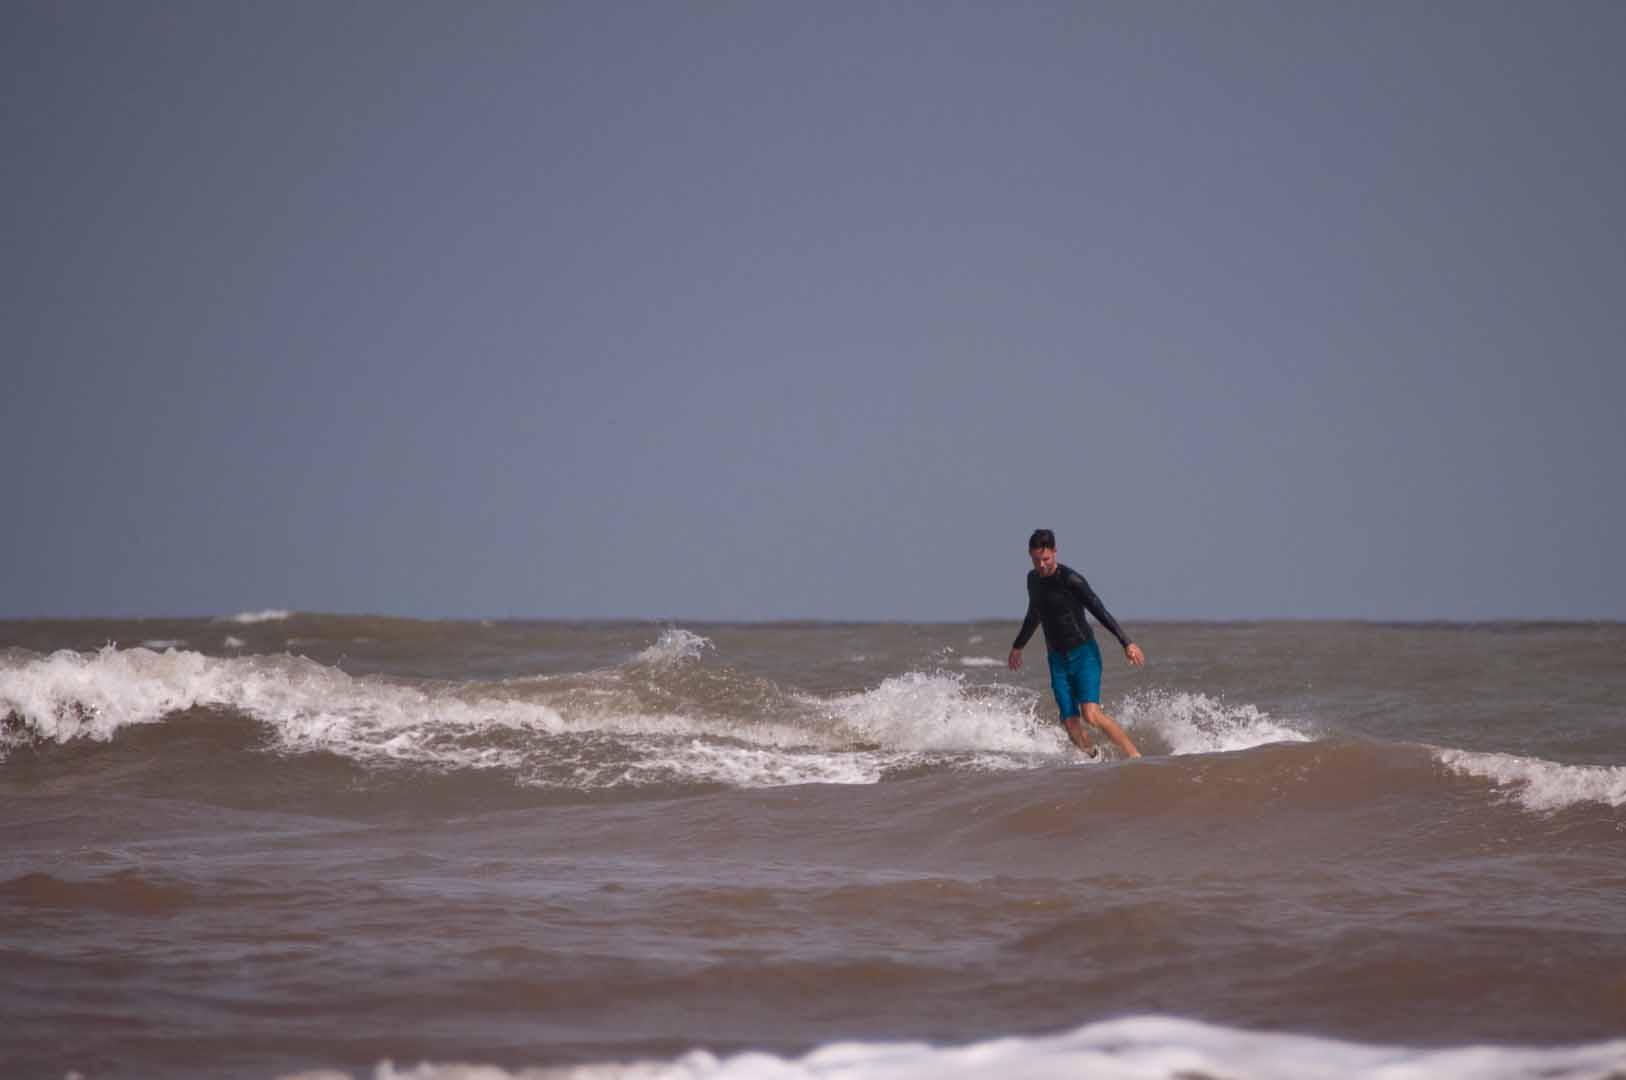 SurfsideJuly2_20150702_059